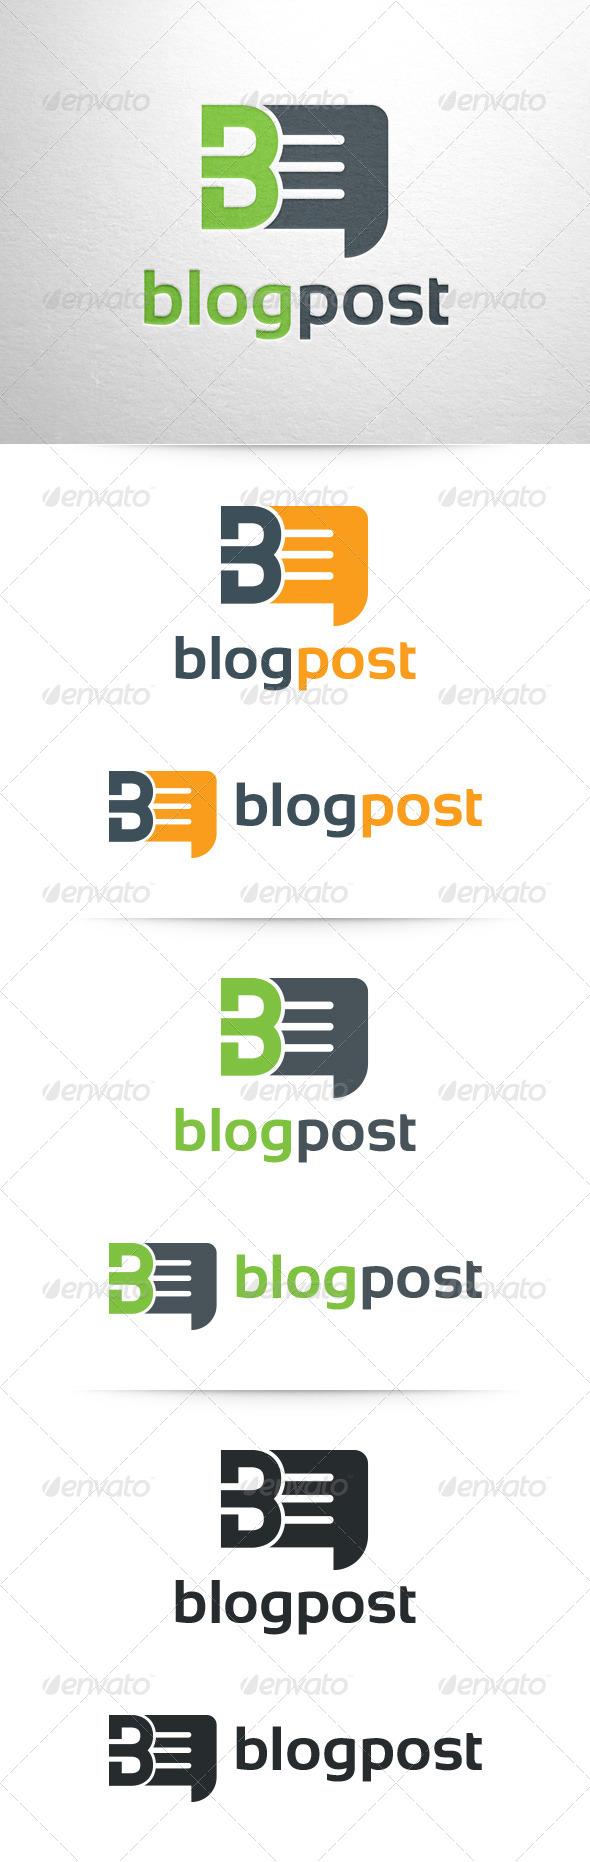 GraphicRiver Blogpost Letter B Logo 6699554